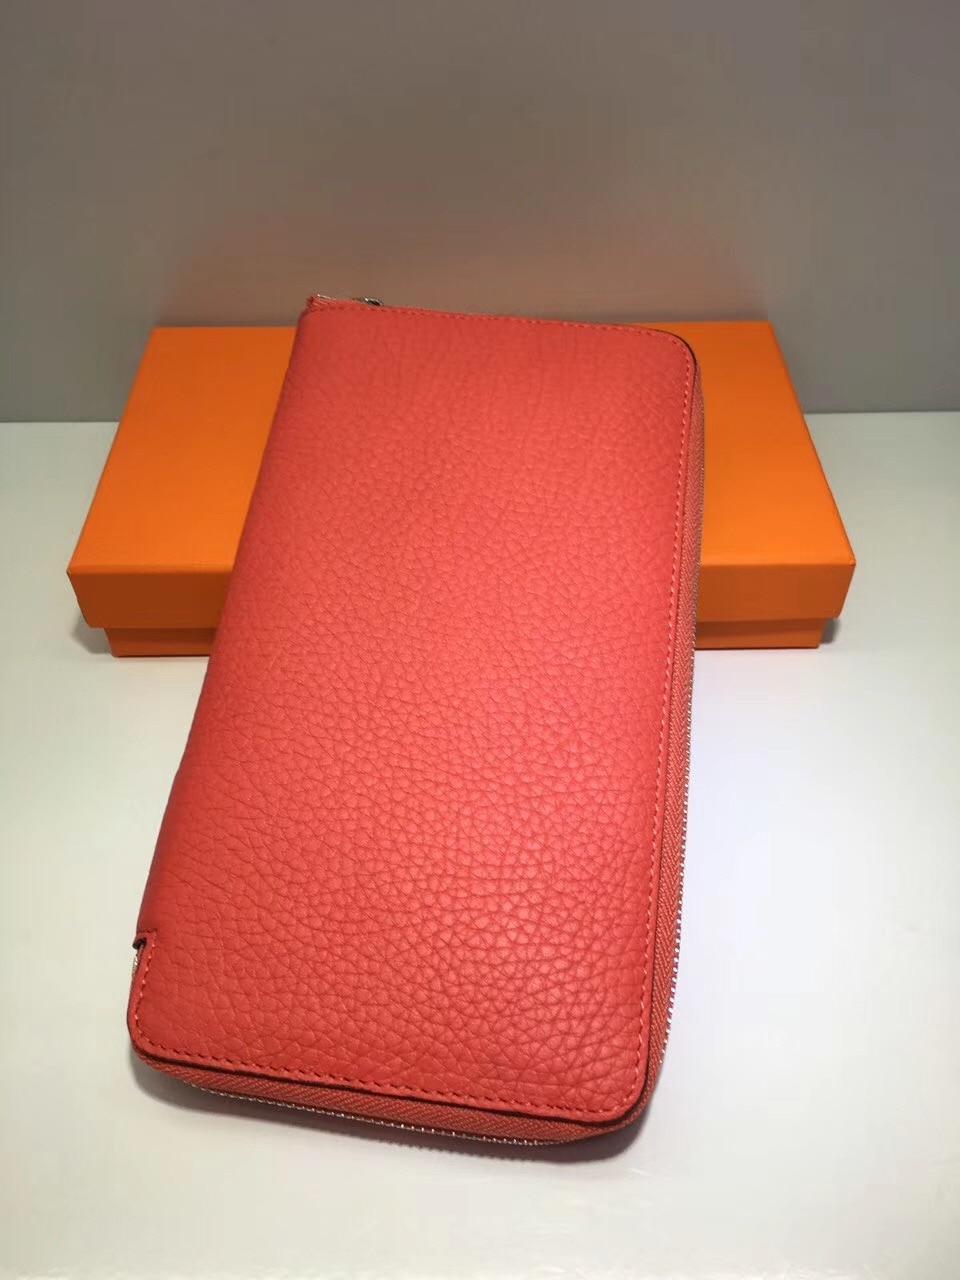 2017 Famous Brand Money Bag Genuine Leather Bussiness Wallets Women General Zipper Clutch Long Purses Card Holder Iphone Pocket